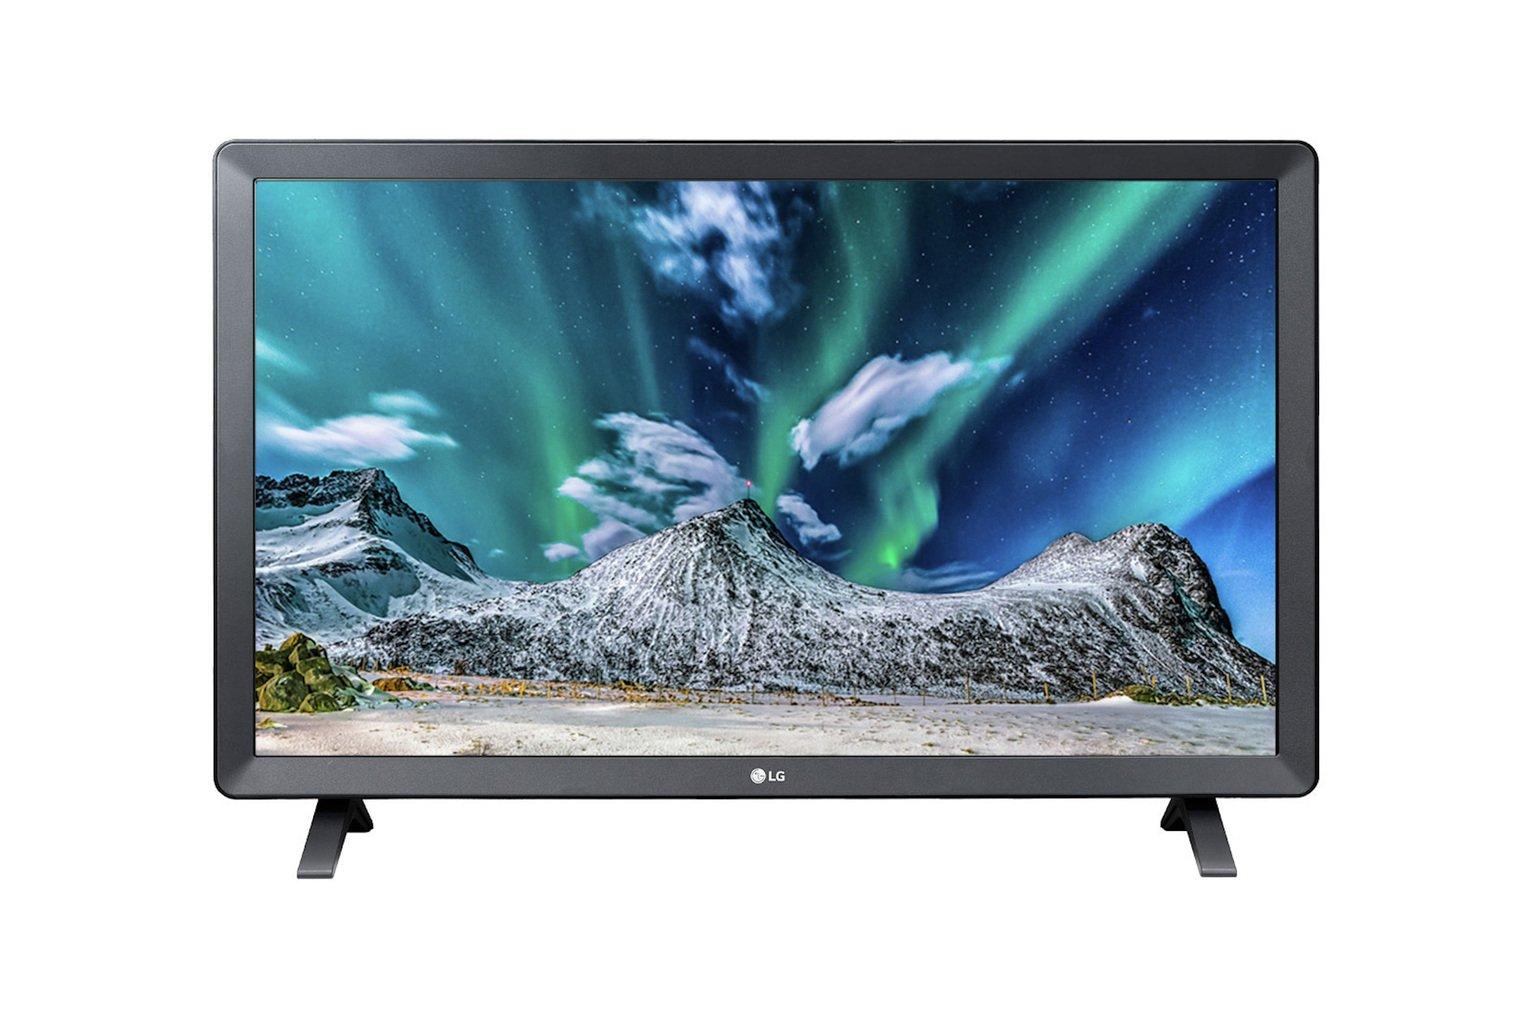 LG 24 Inch 24TL520S-PZ Smart HD Ready LED TV